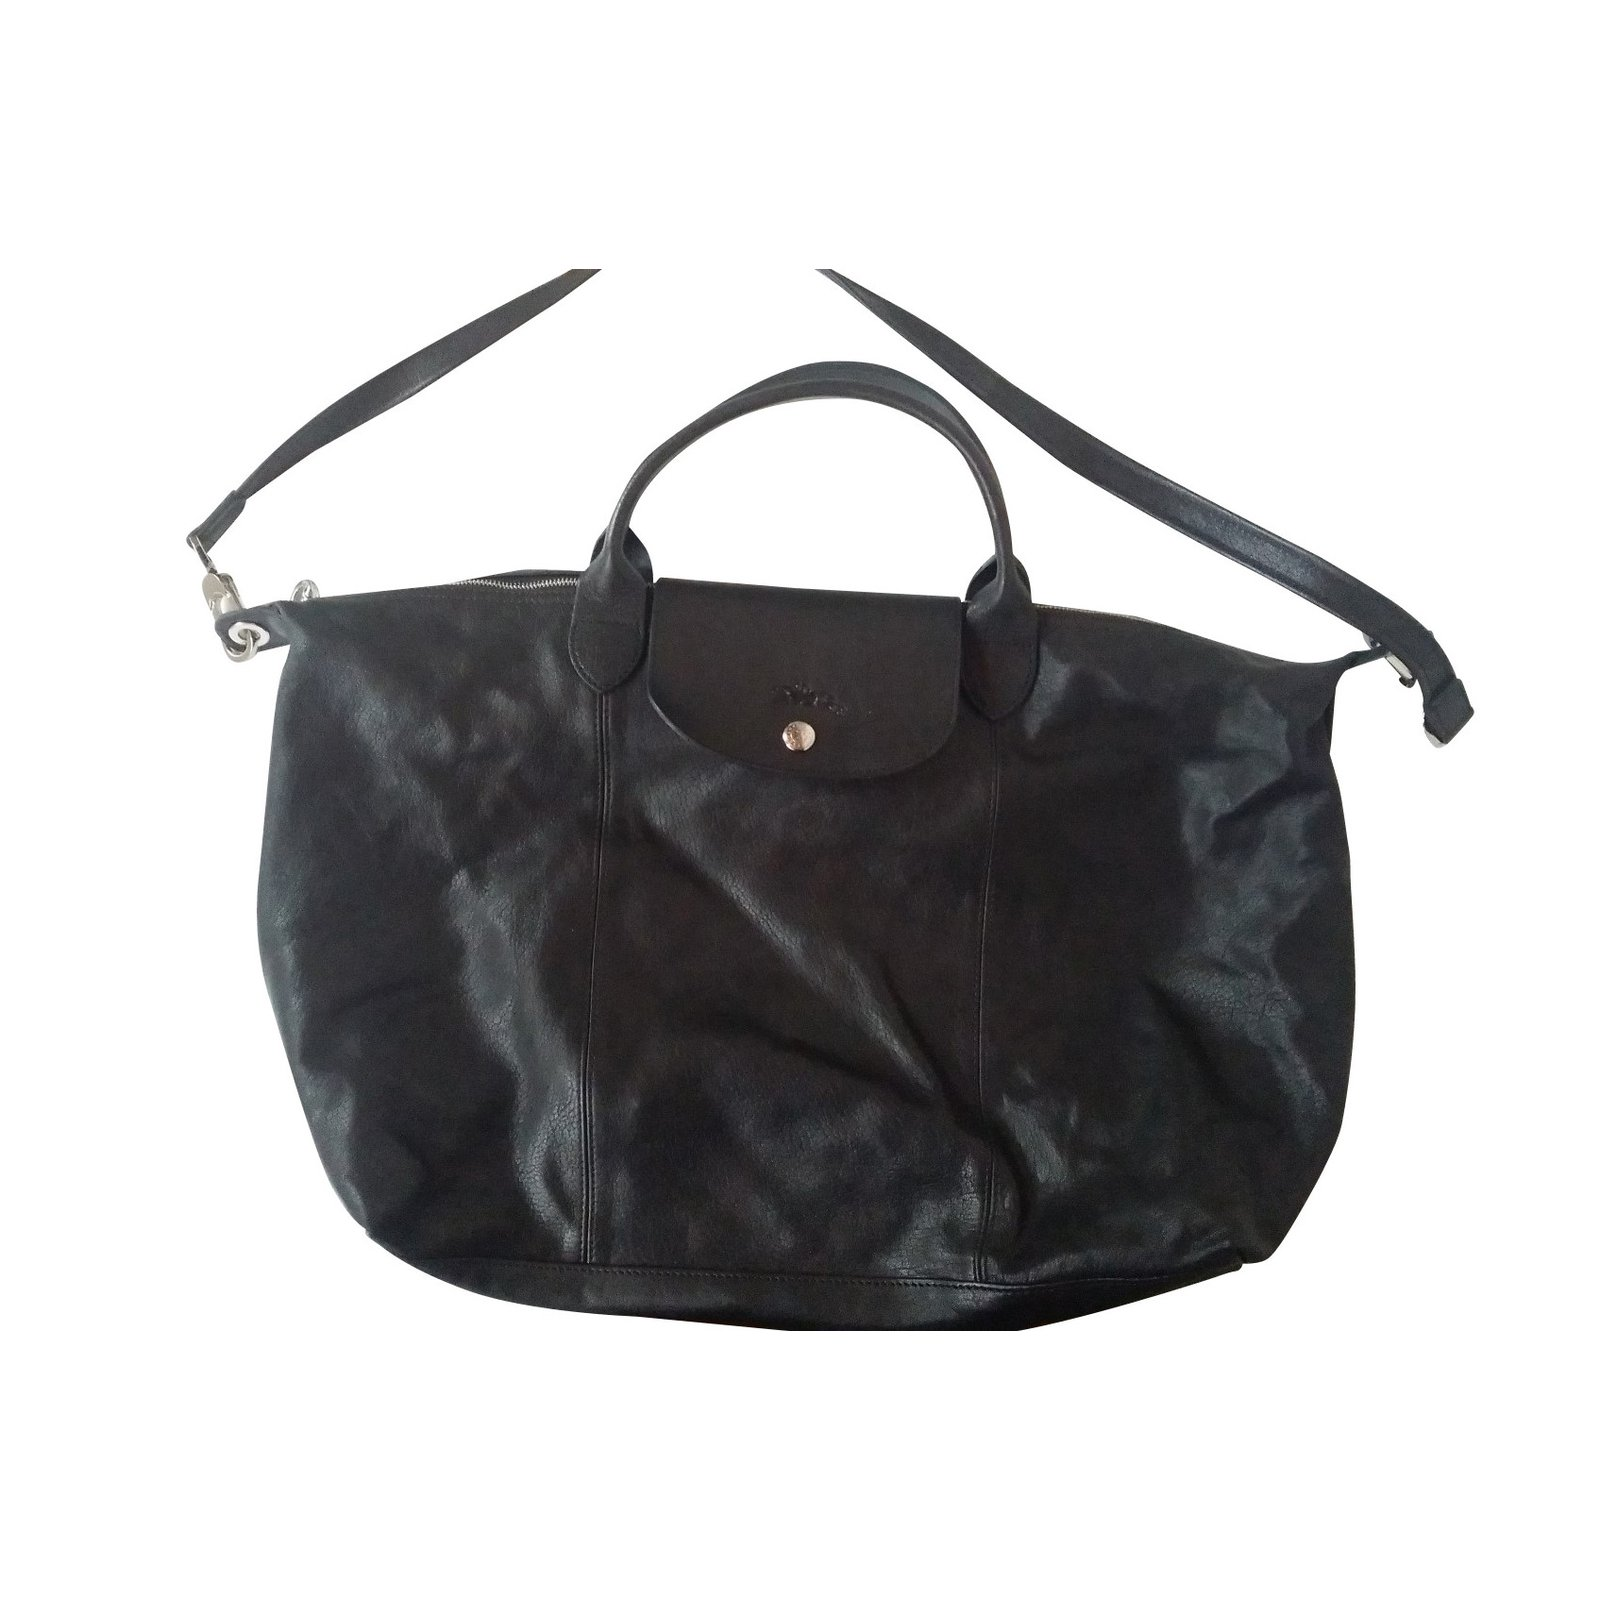 sacs main longchamp sac main pliage cuir cuir noir joli closet. Black Bedroom Furniture Sets. Home Design Ideas